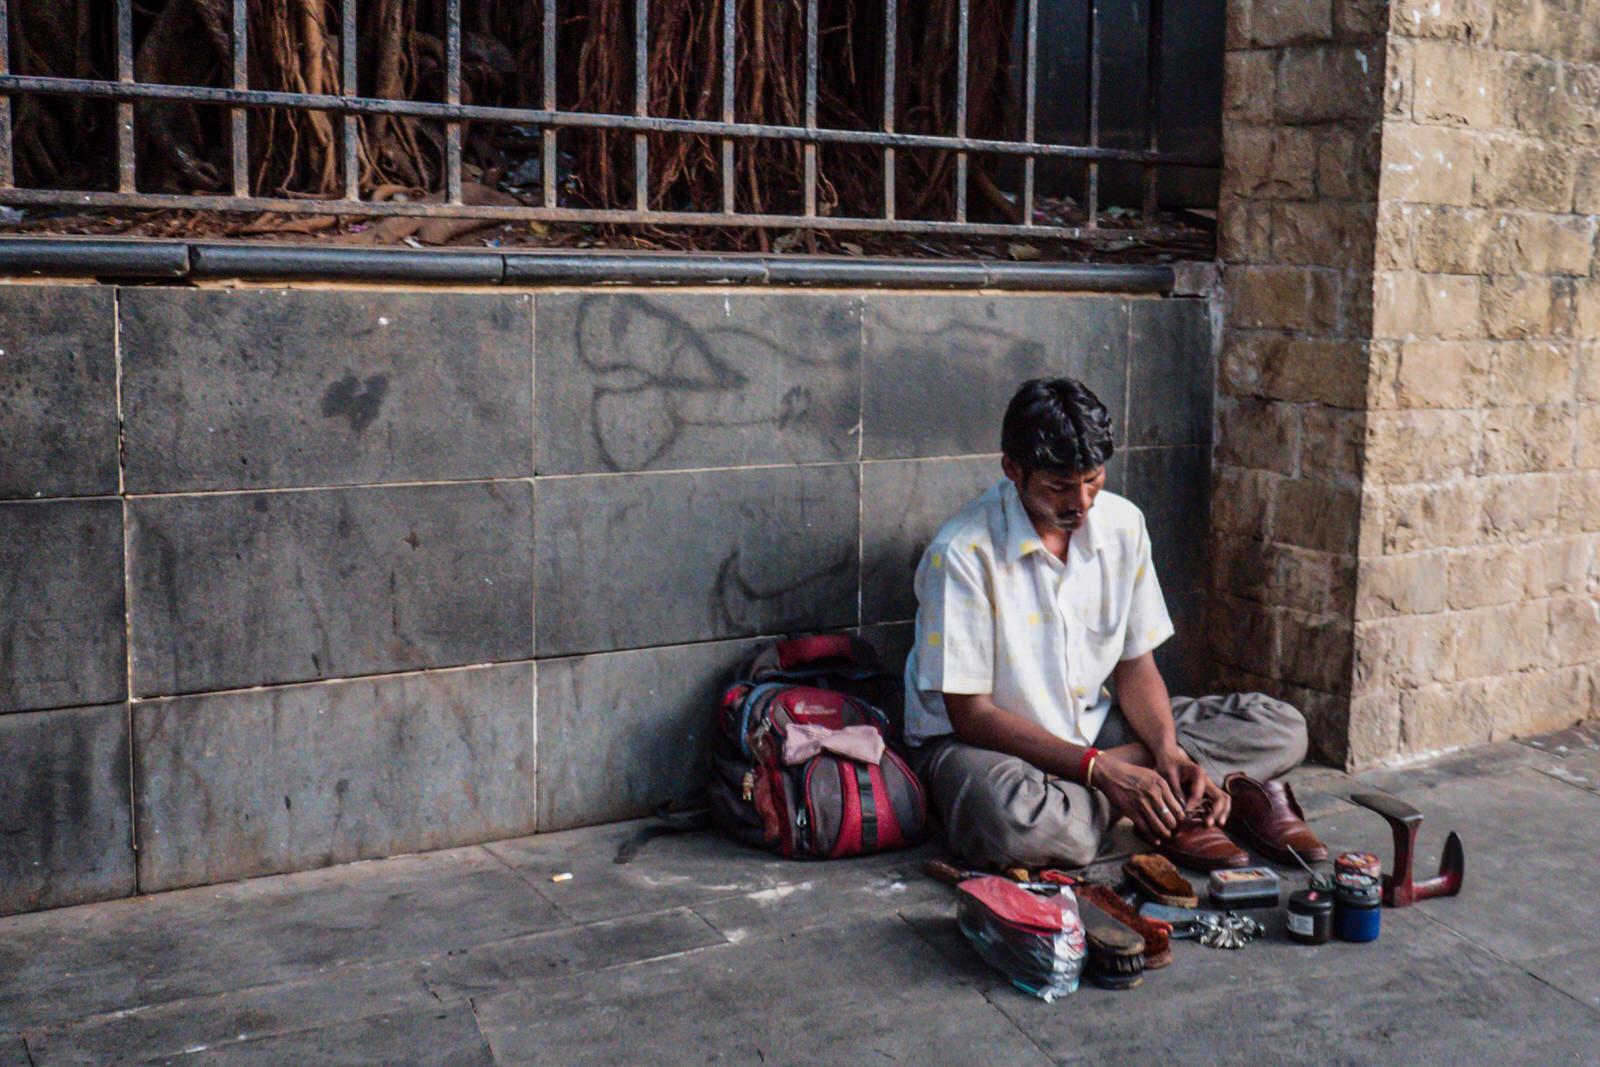 India2016-KathleenHertelPhotography-18.jpg